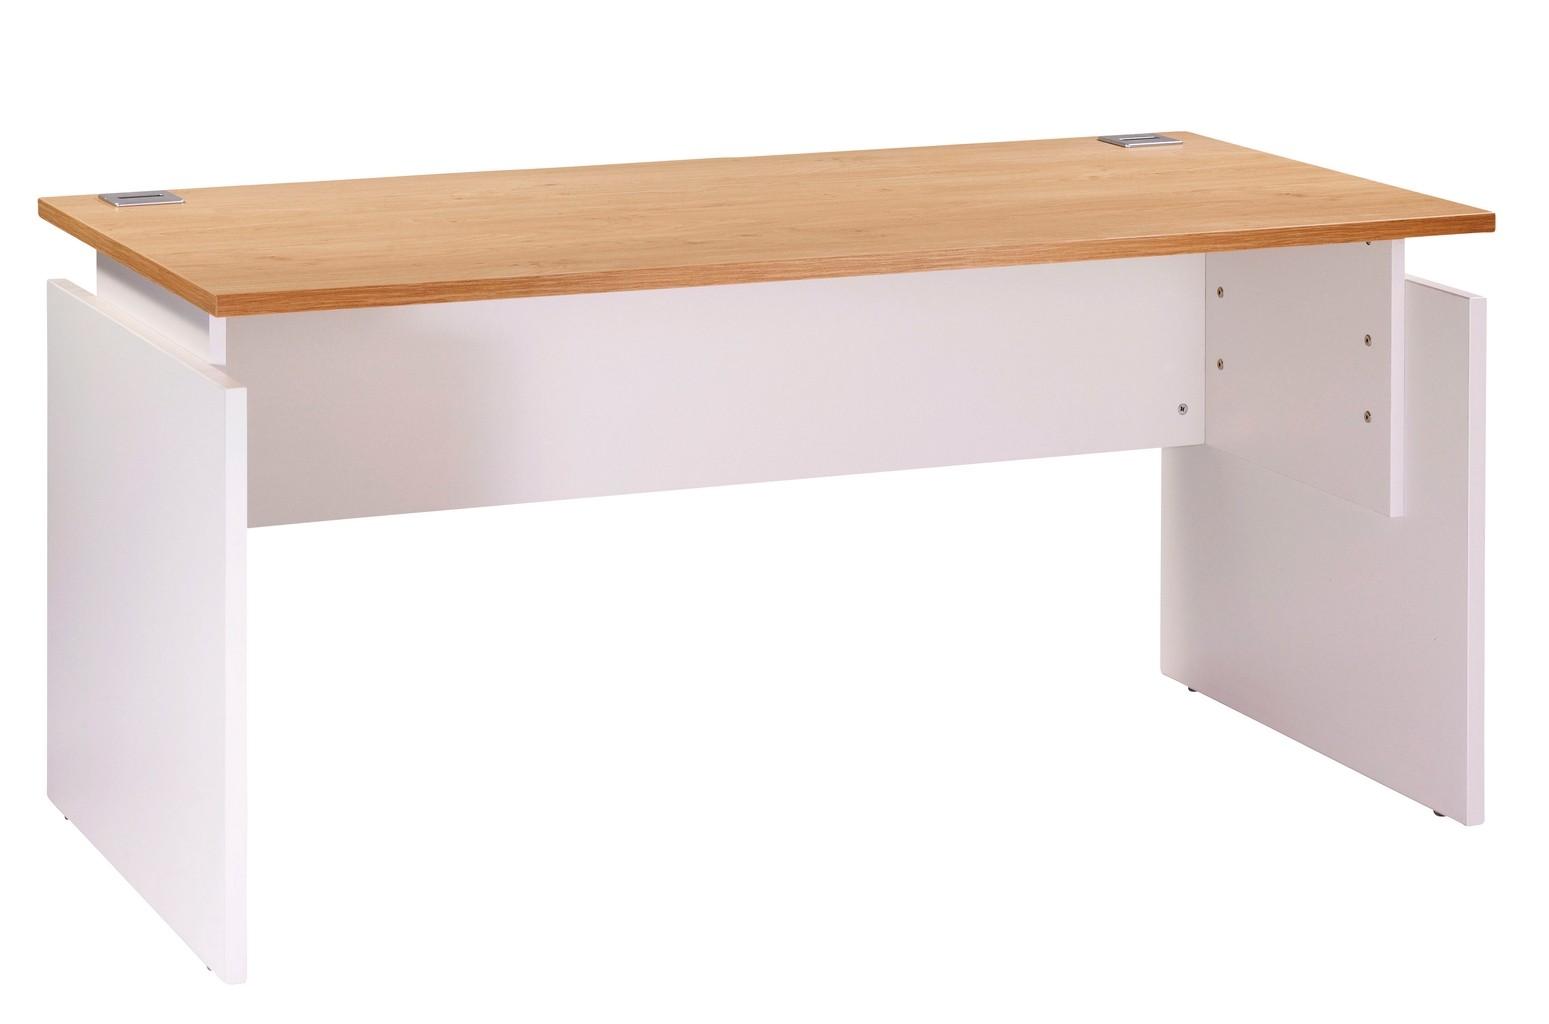 Bureau 80 cm largeur bureau chez conforama Lepolyglotte